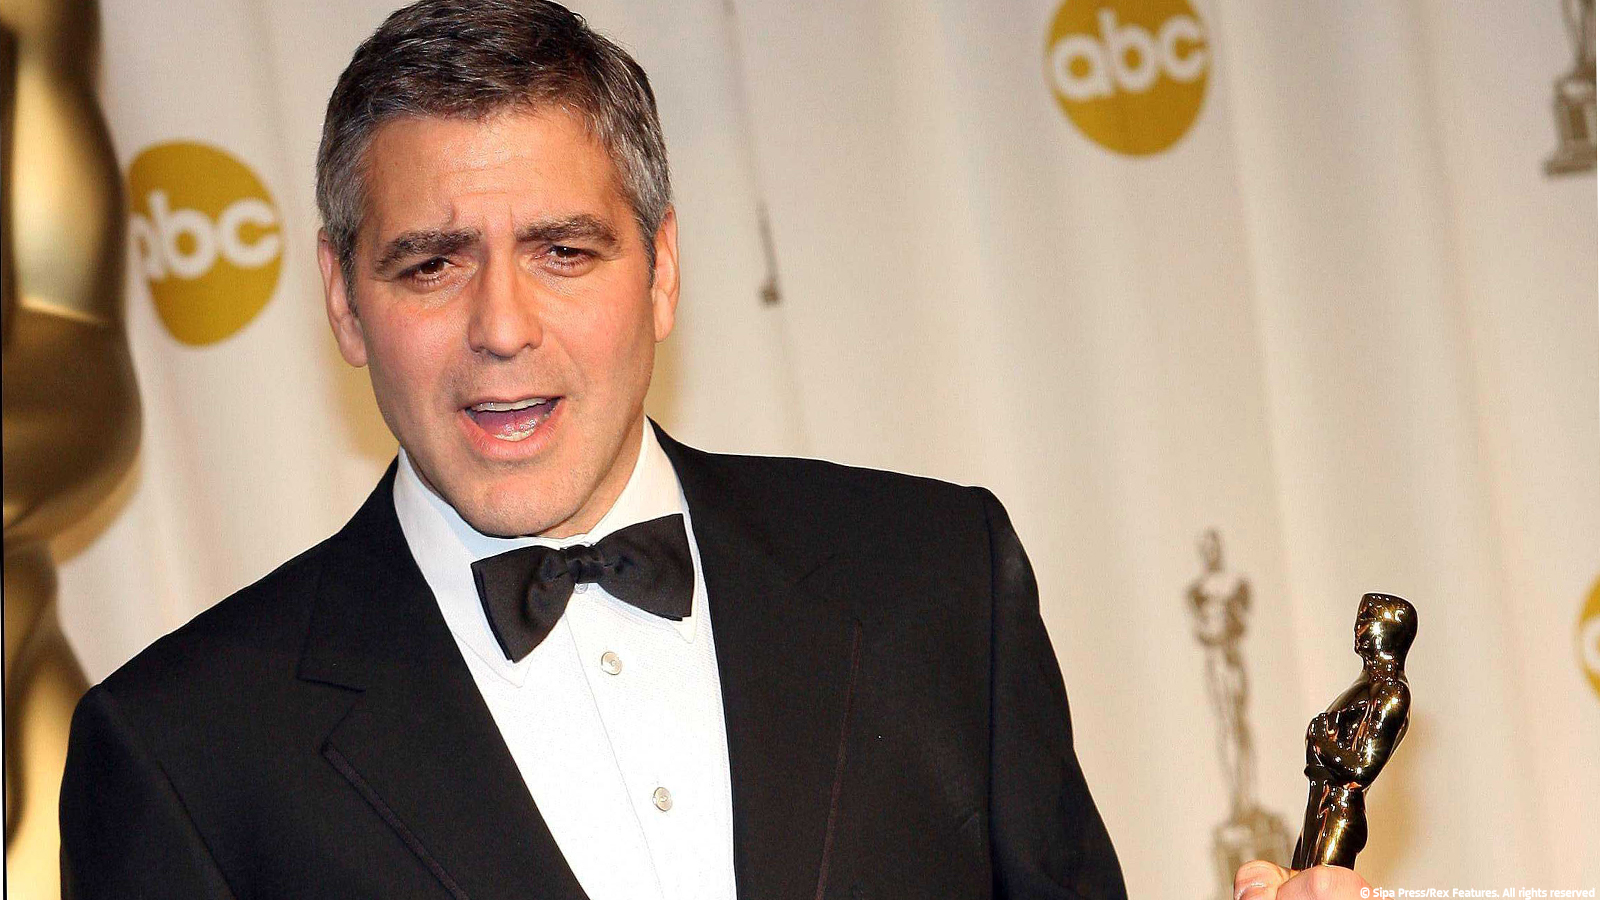 ASTAZI E ZIUA TA George Clooney3